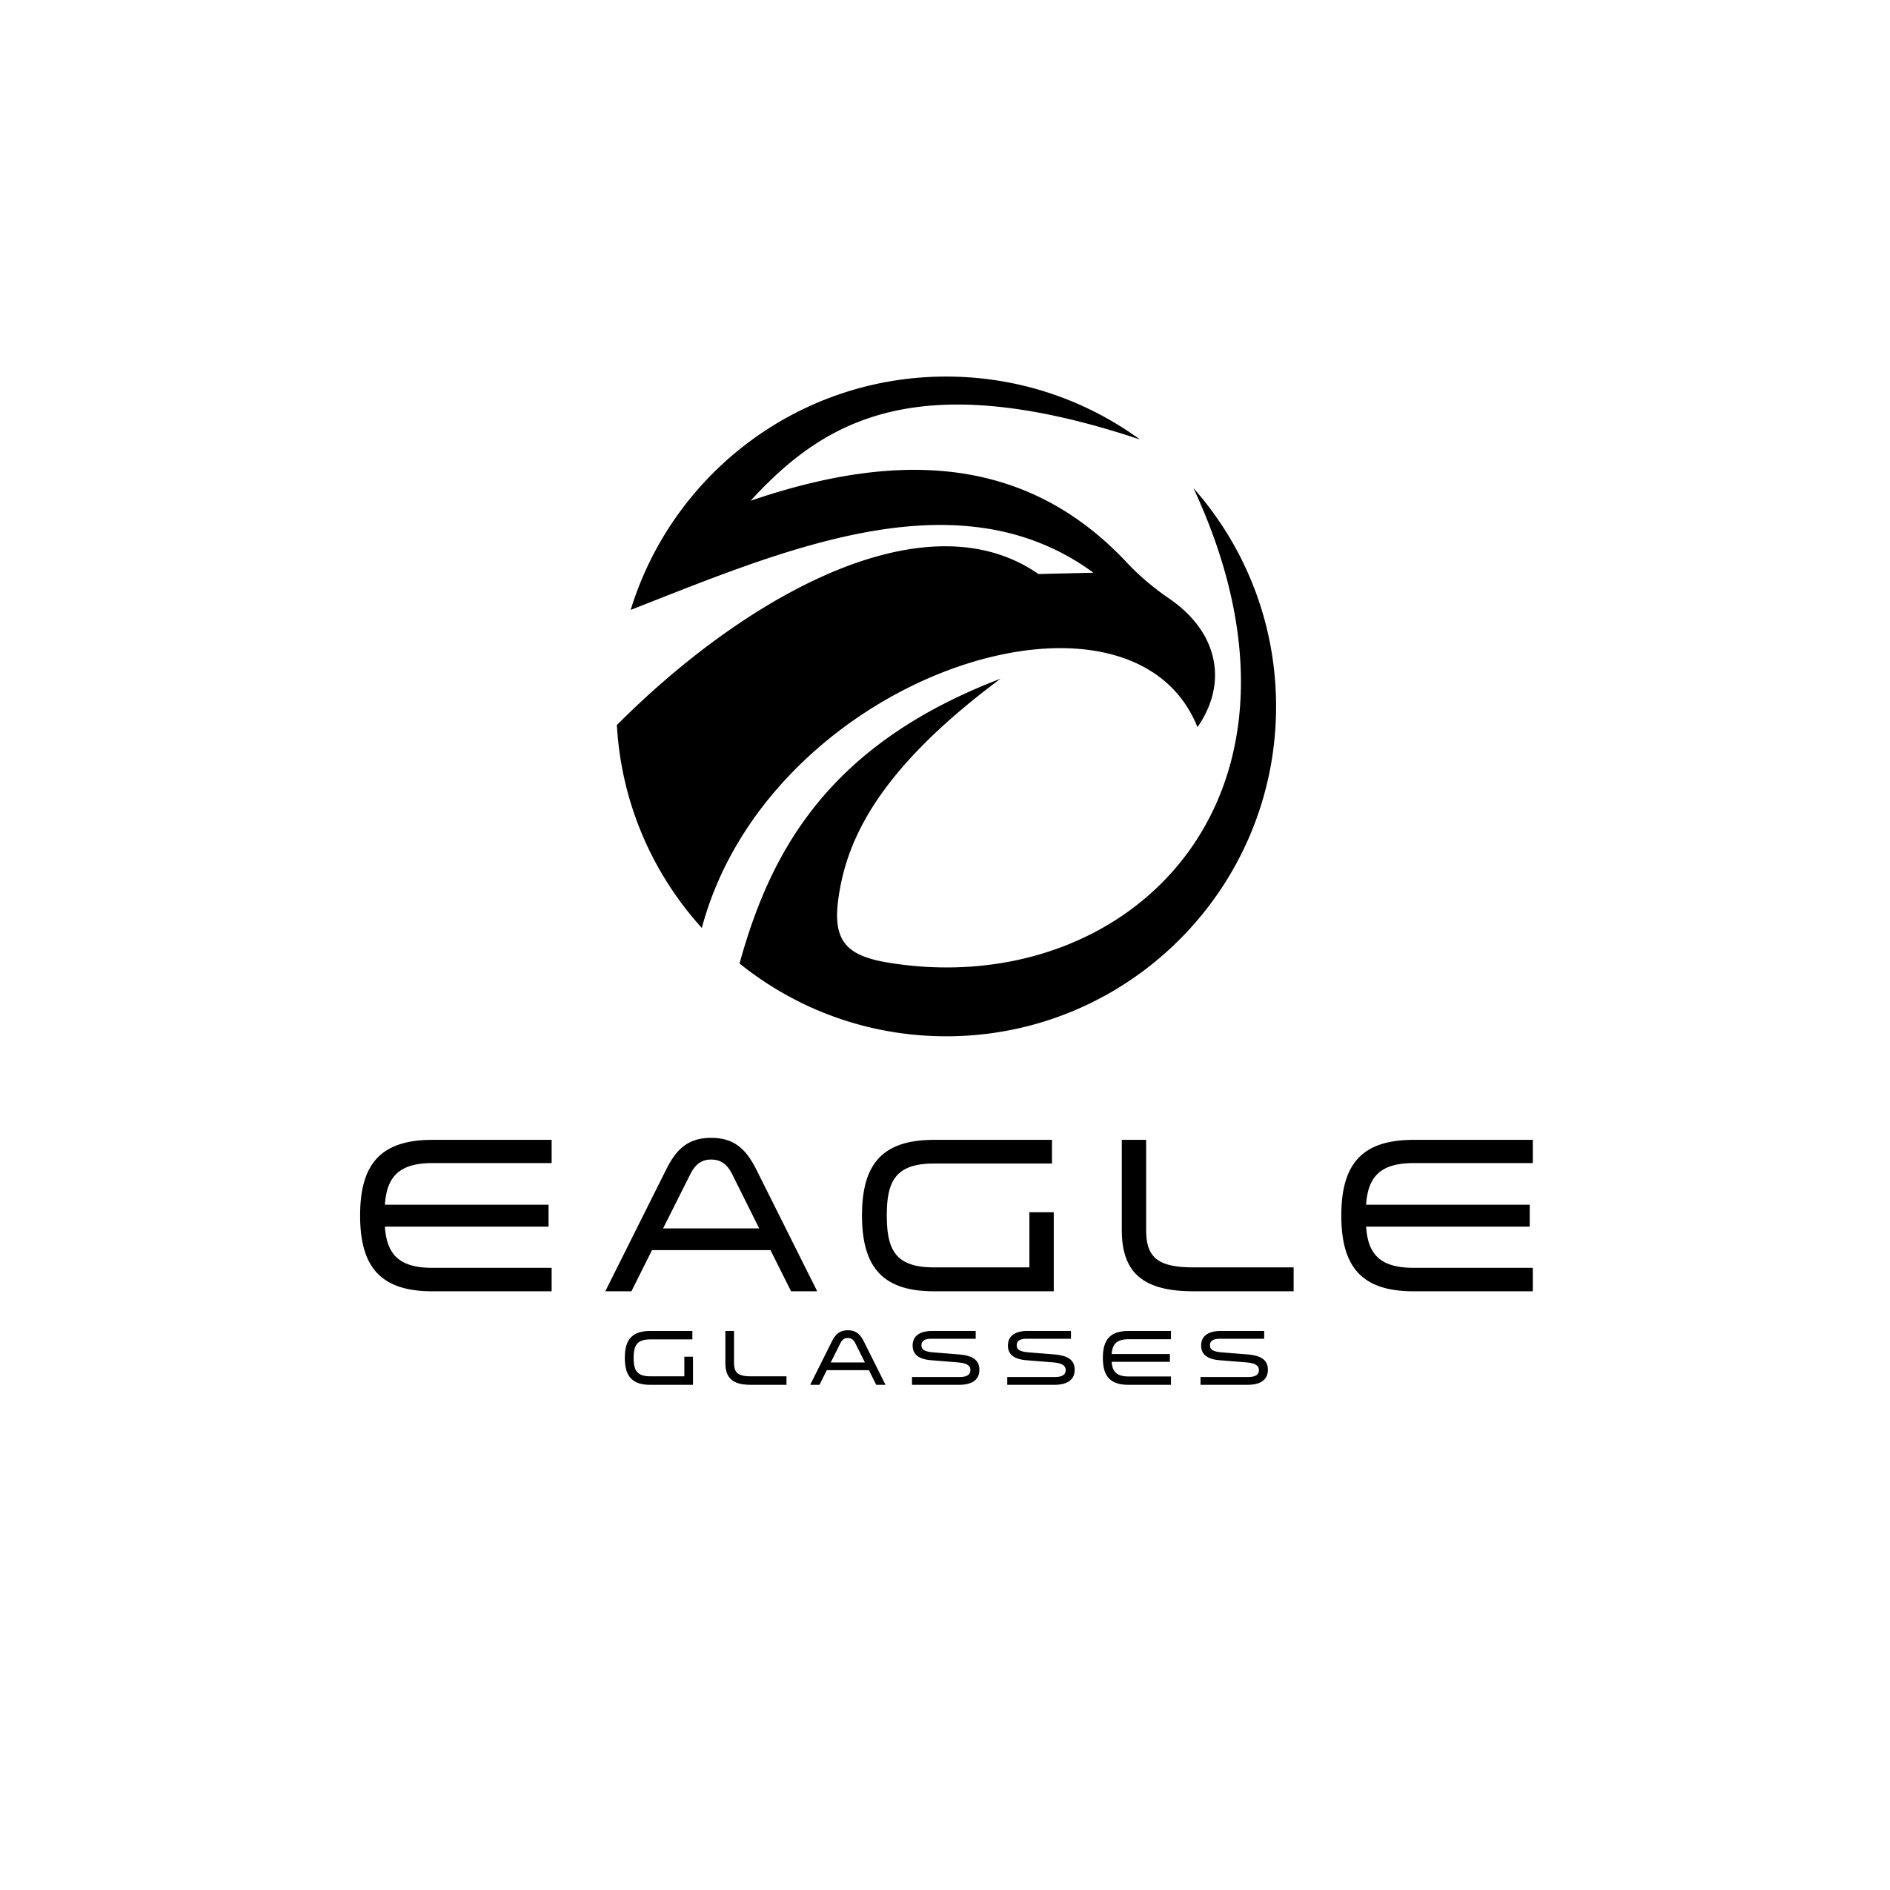 EAGLE GLASSES